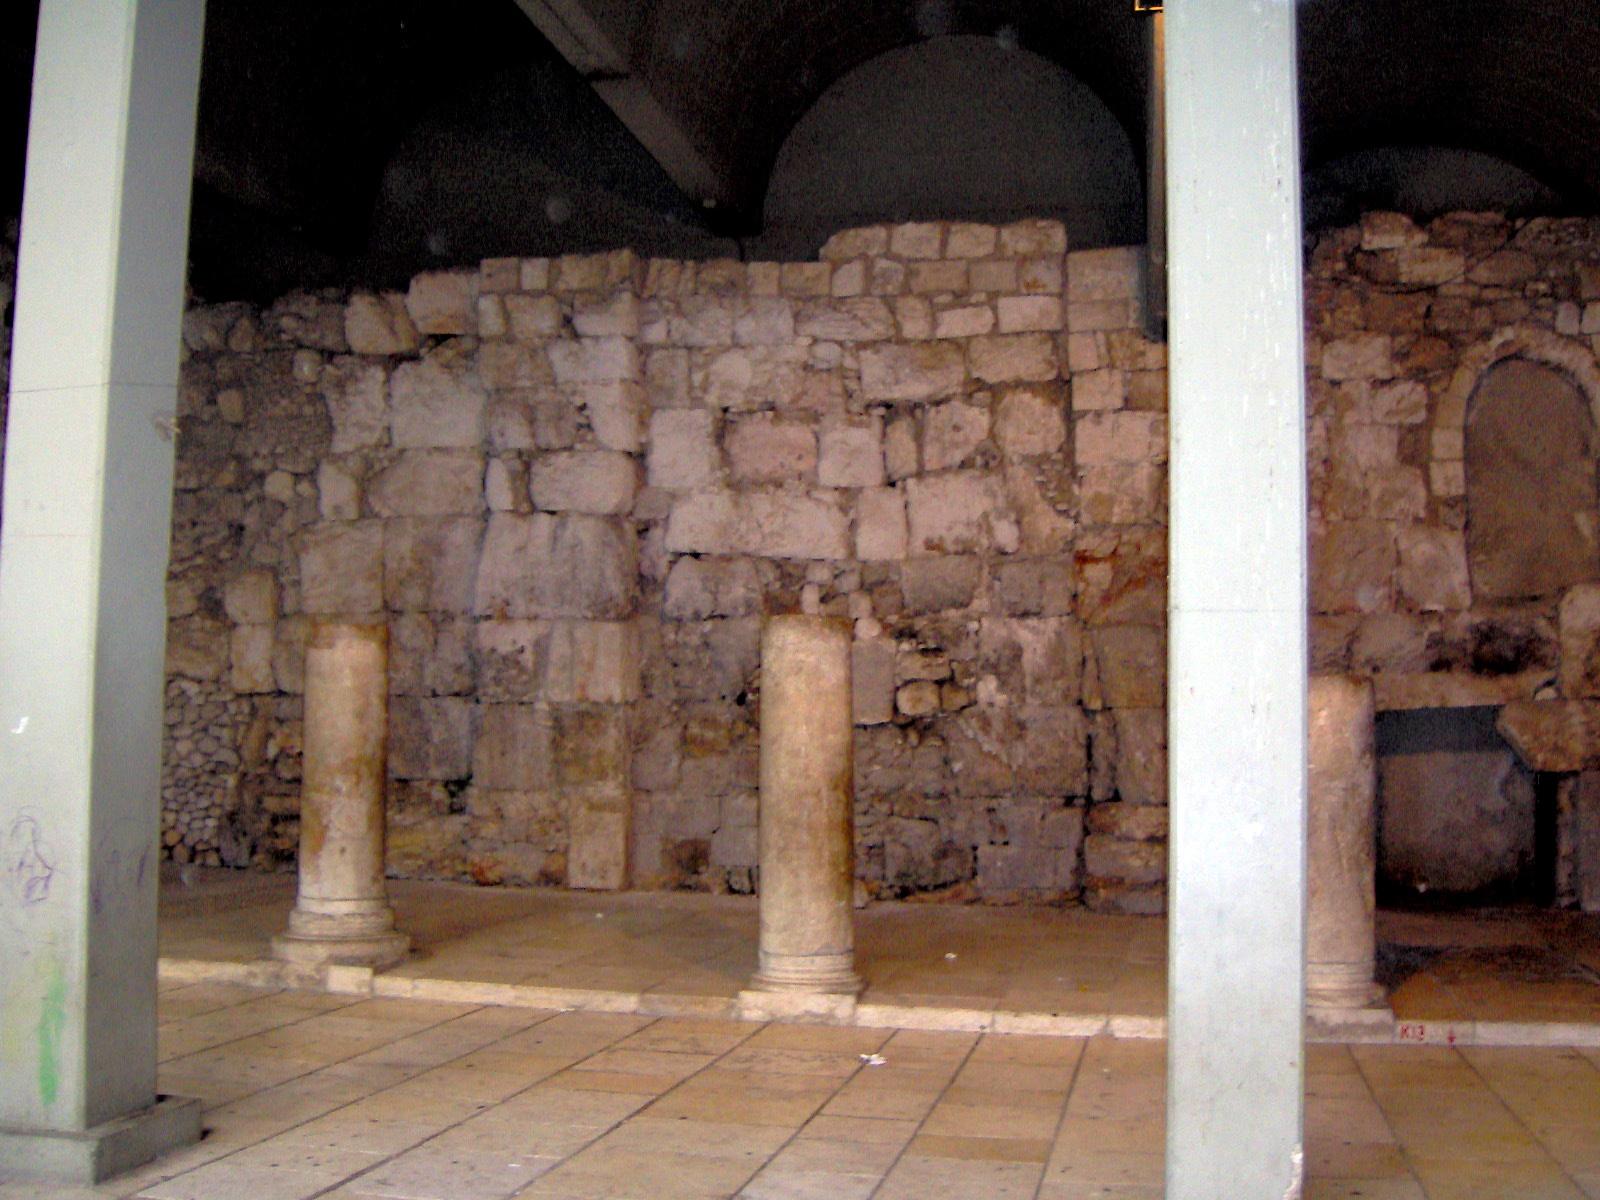 AE25 de la Rebelión de Bar Kojba. Judea. 132-135 d.C. Cardo-jerusalem